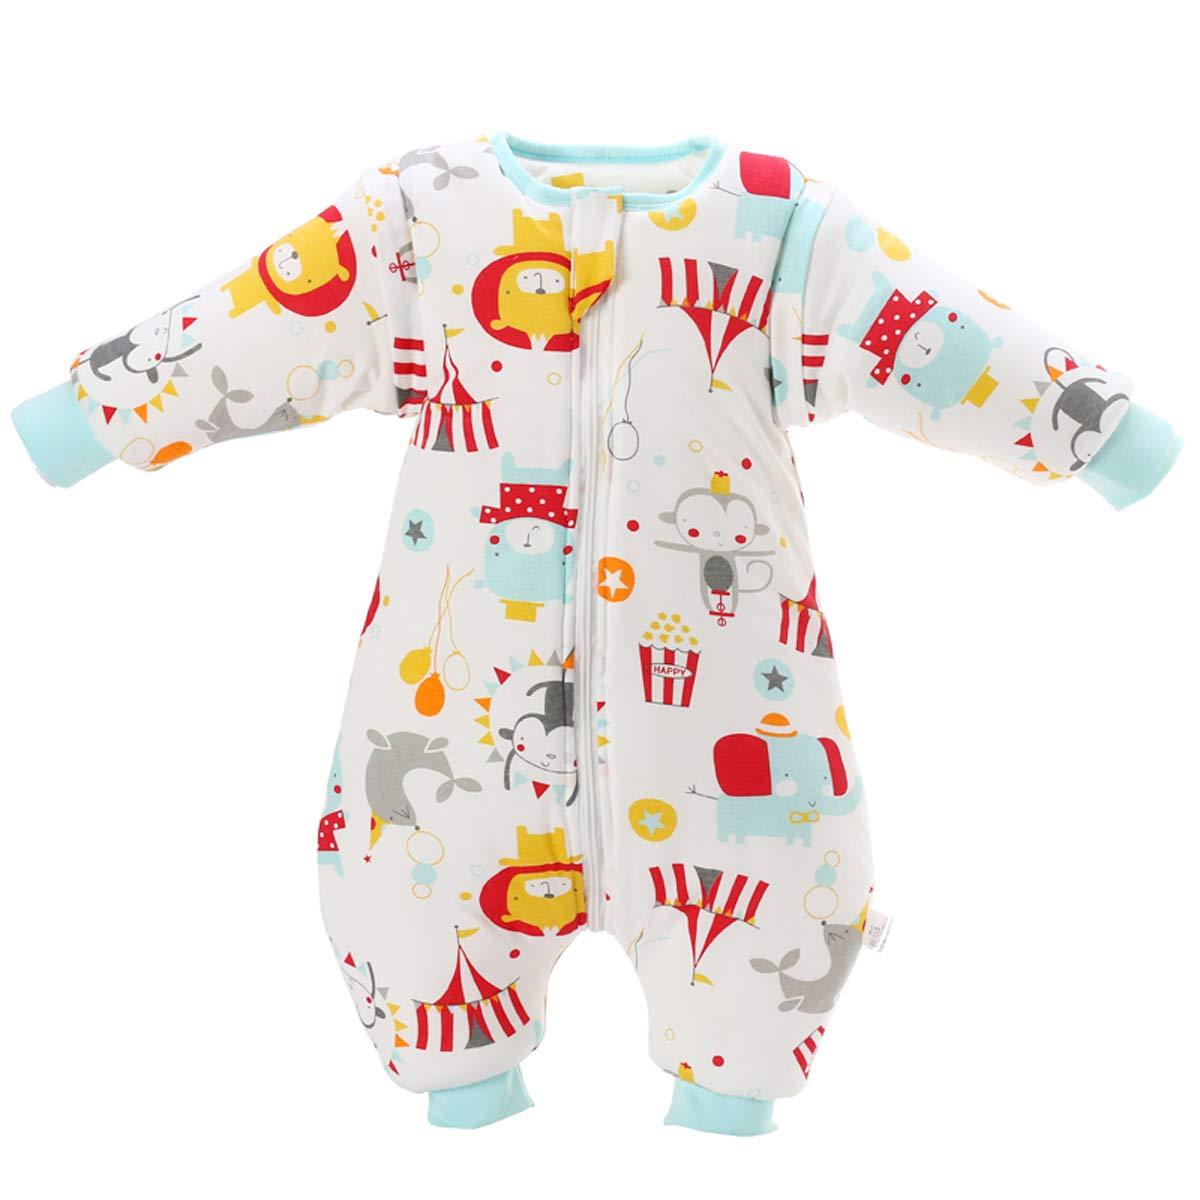 MIKAFEN Baby Sleeping Bag Legs Warm Lined Winter Long Sleeve Winter Sleeping Bag Foot 3.5 Tog